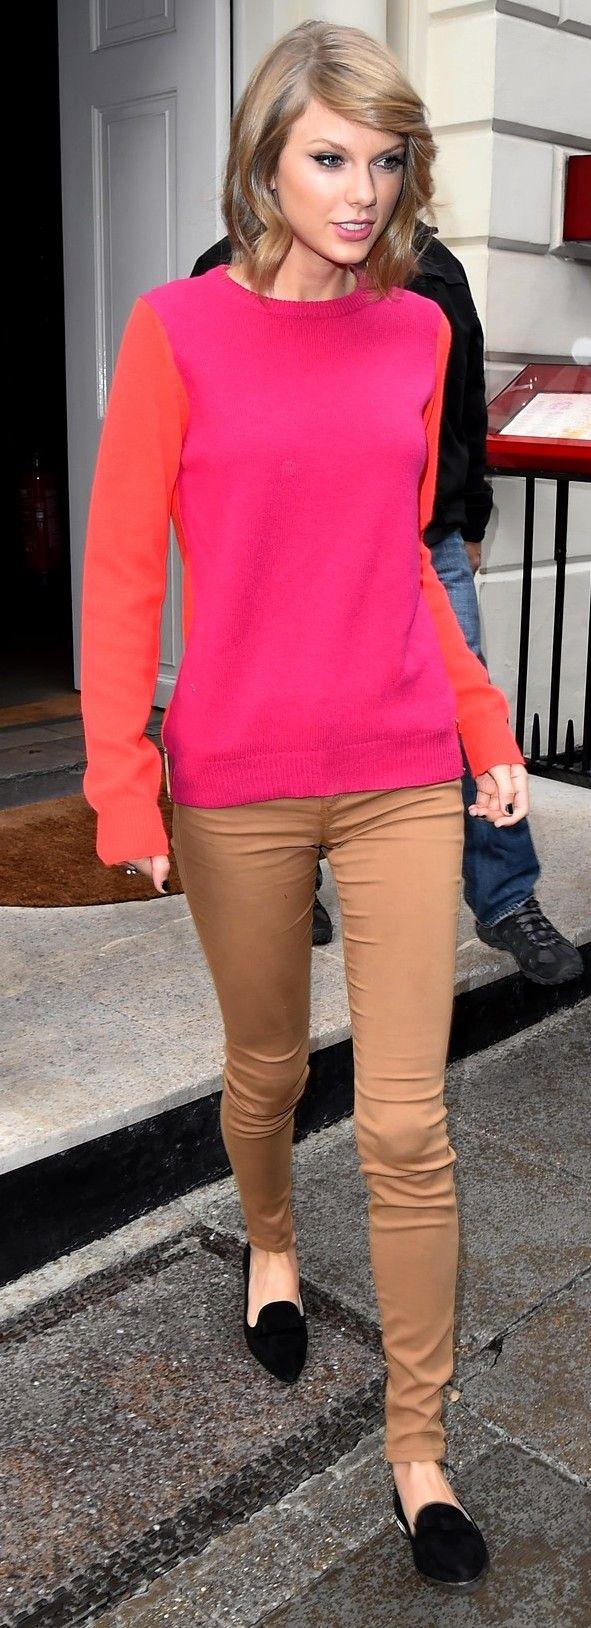 best celeb style images on pinterest celebrity ema stone and